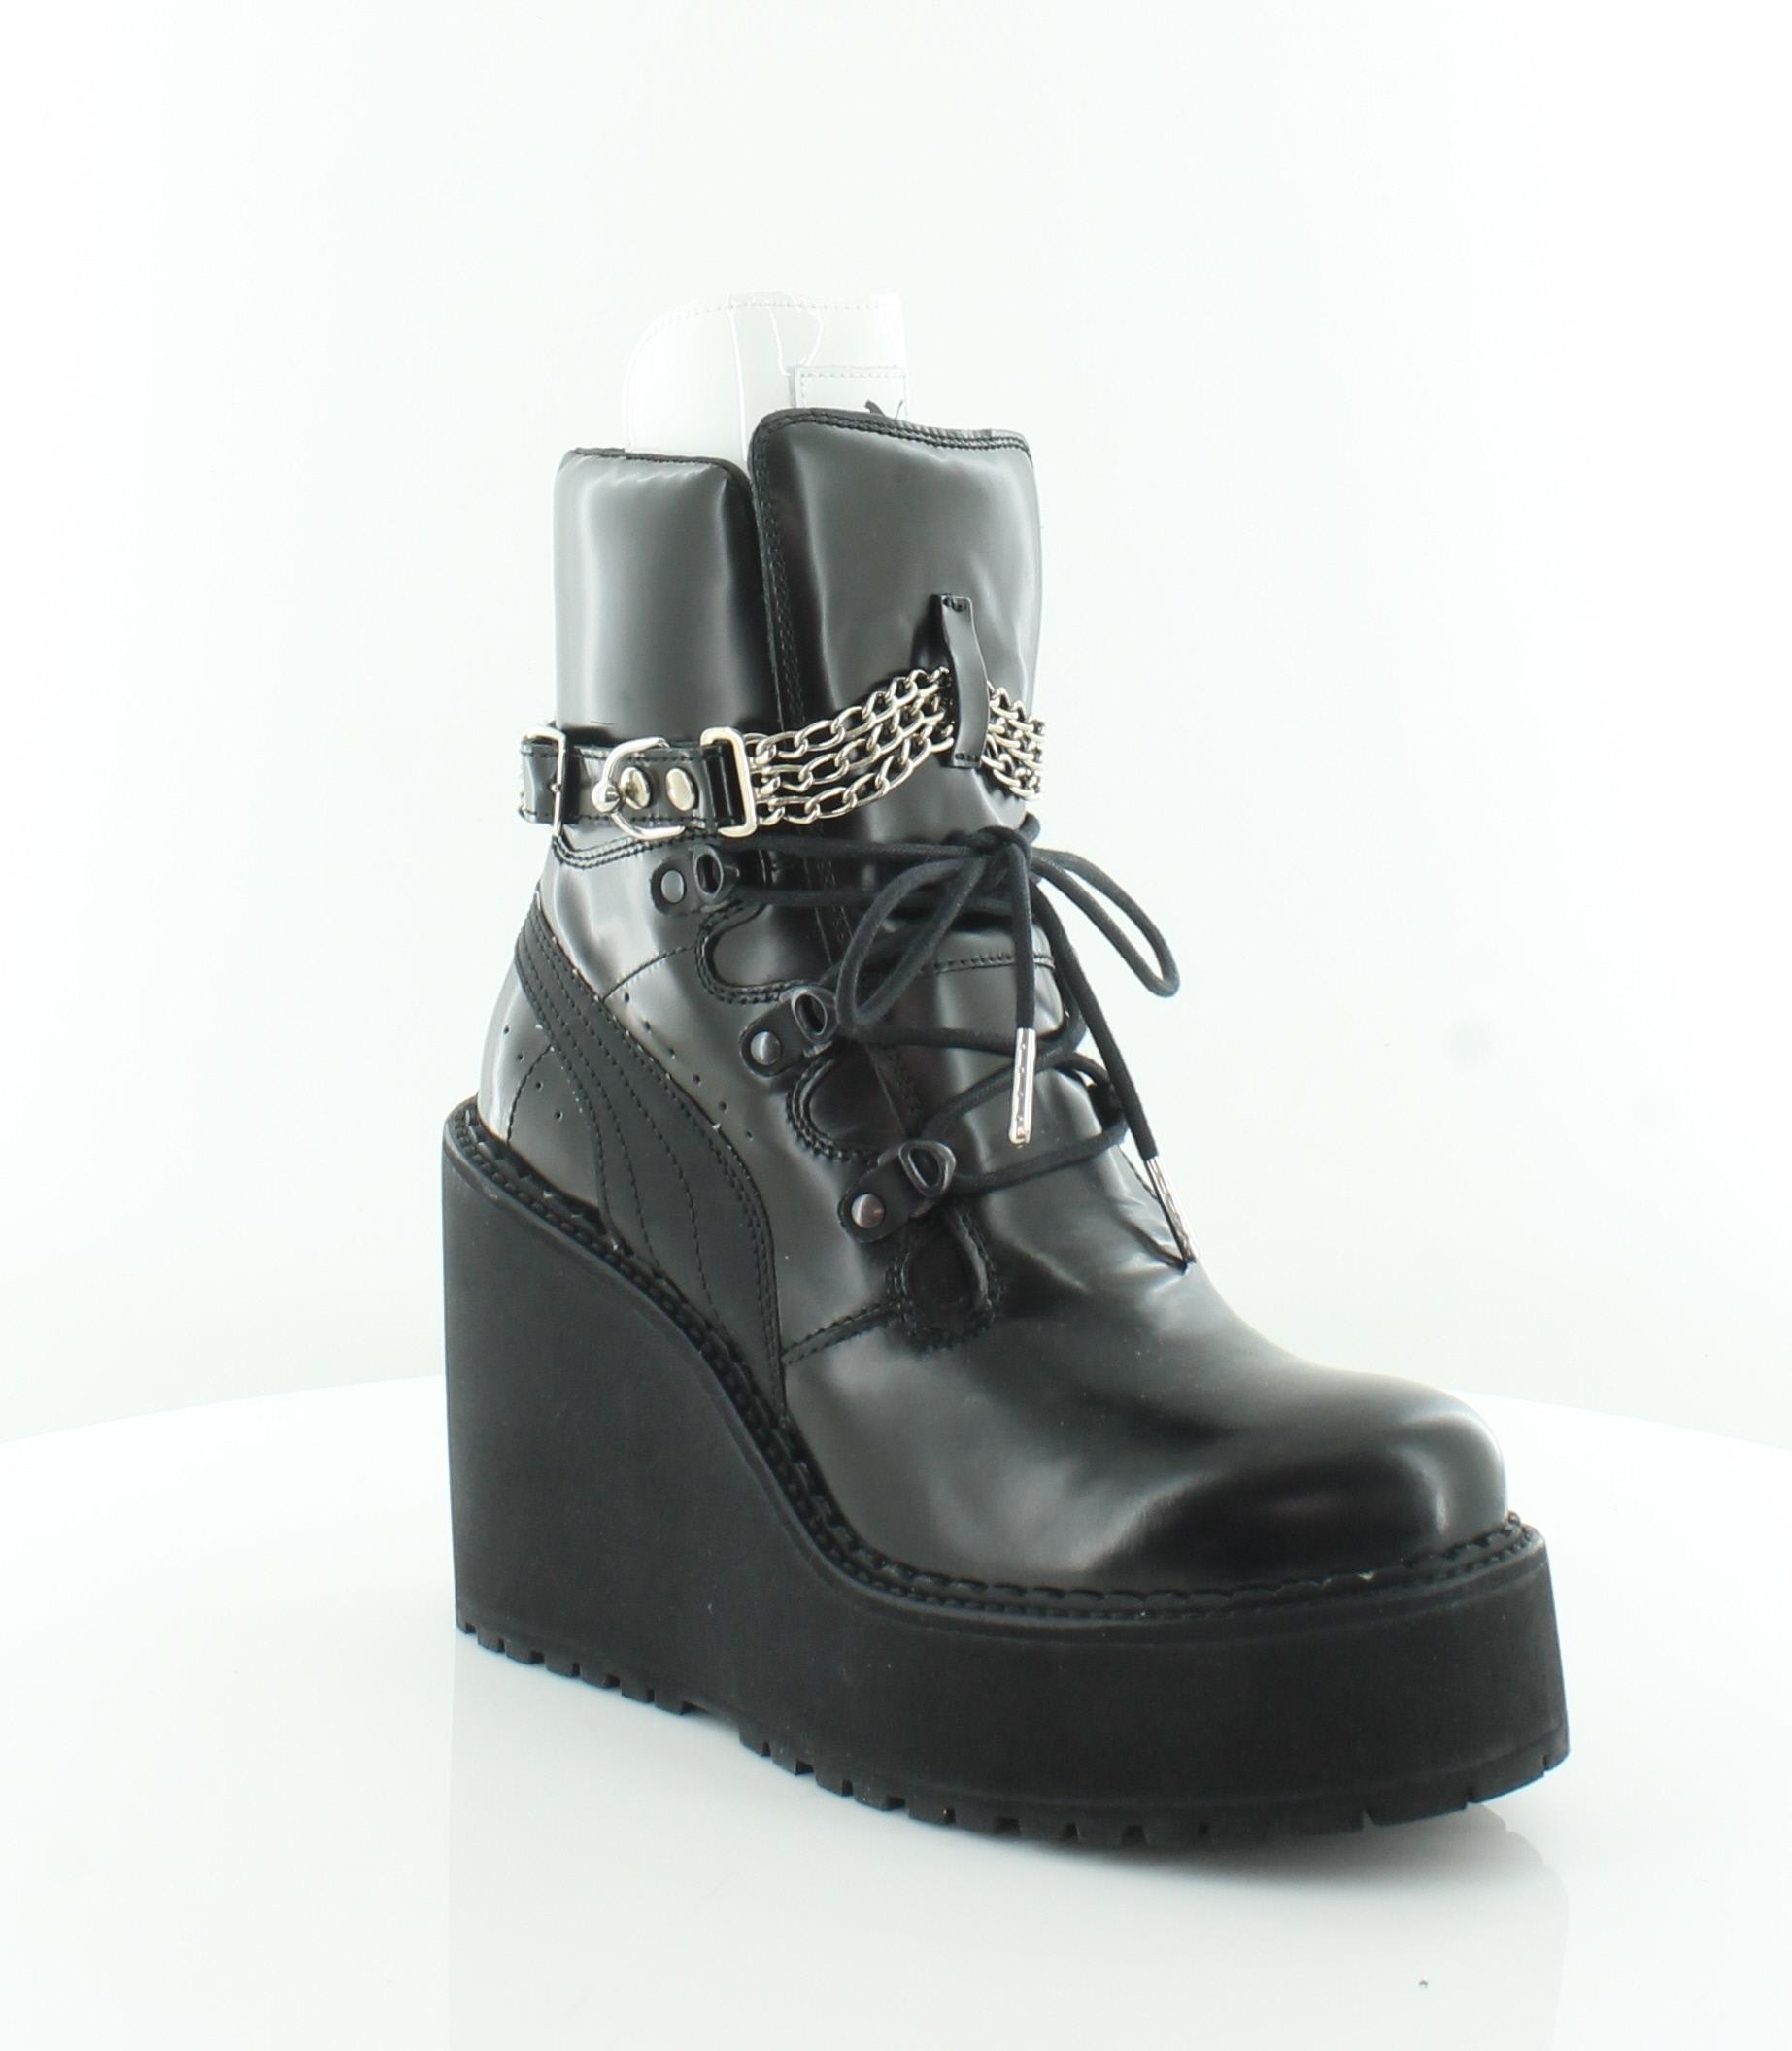 pretty nice 0f515 fa9ca Details about Fenty Puma by Rihanna SB Wdg Rihanna Black Womens Shoes 8 M  Boots MSRP $350